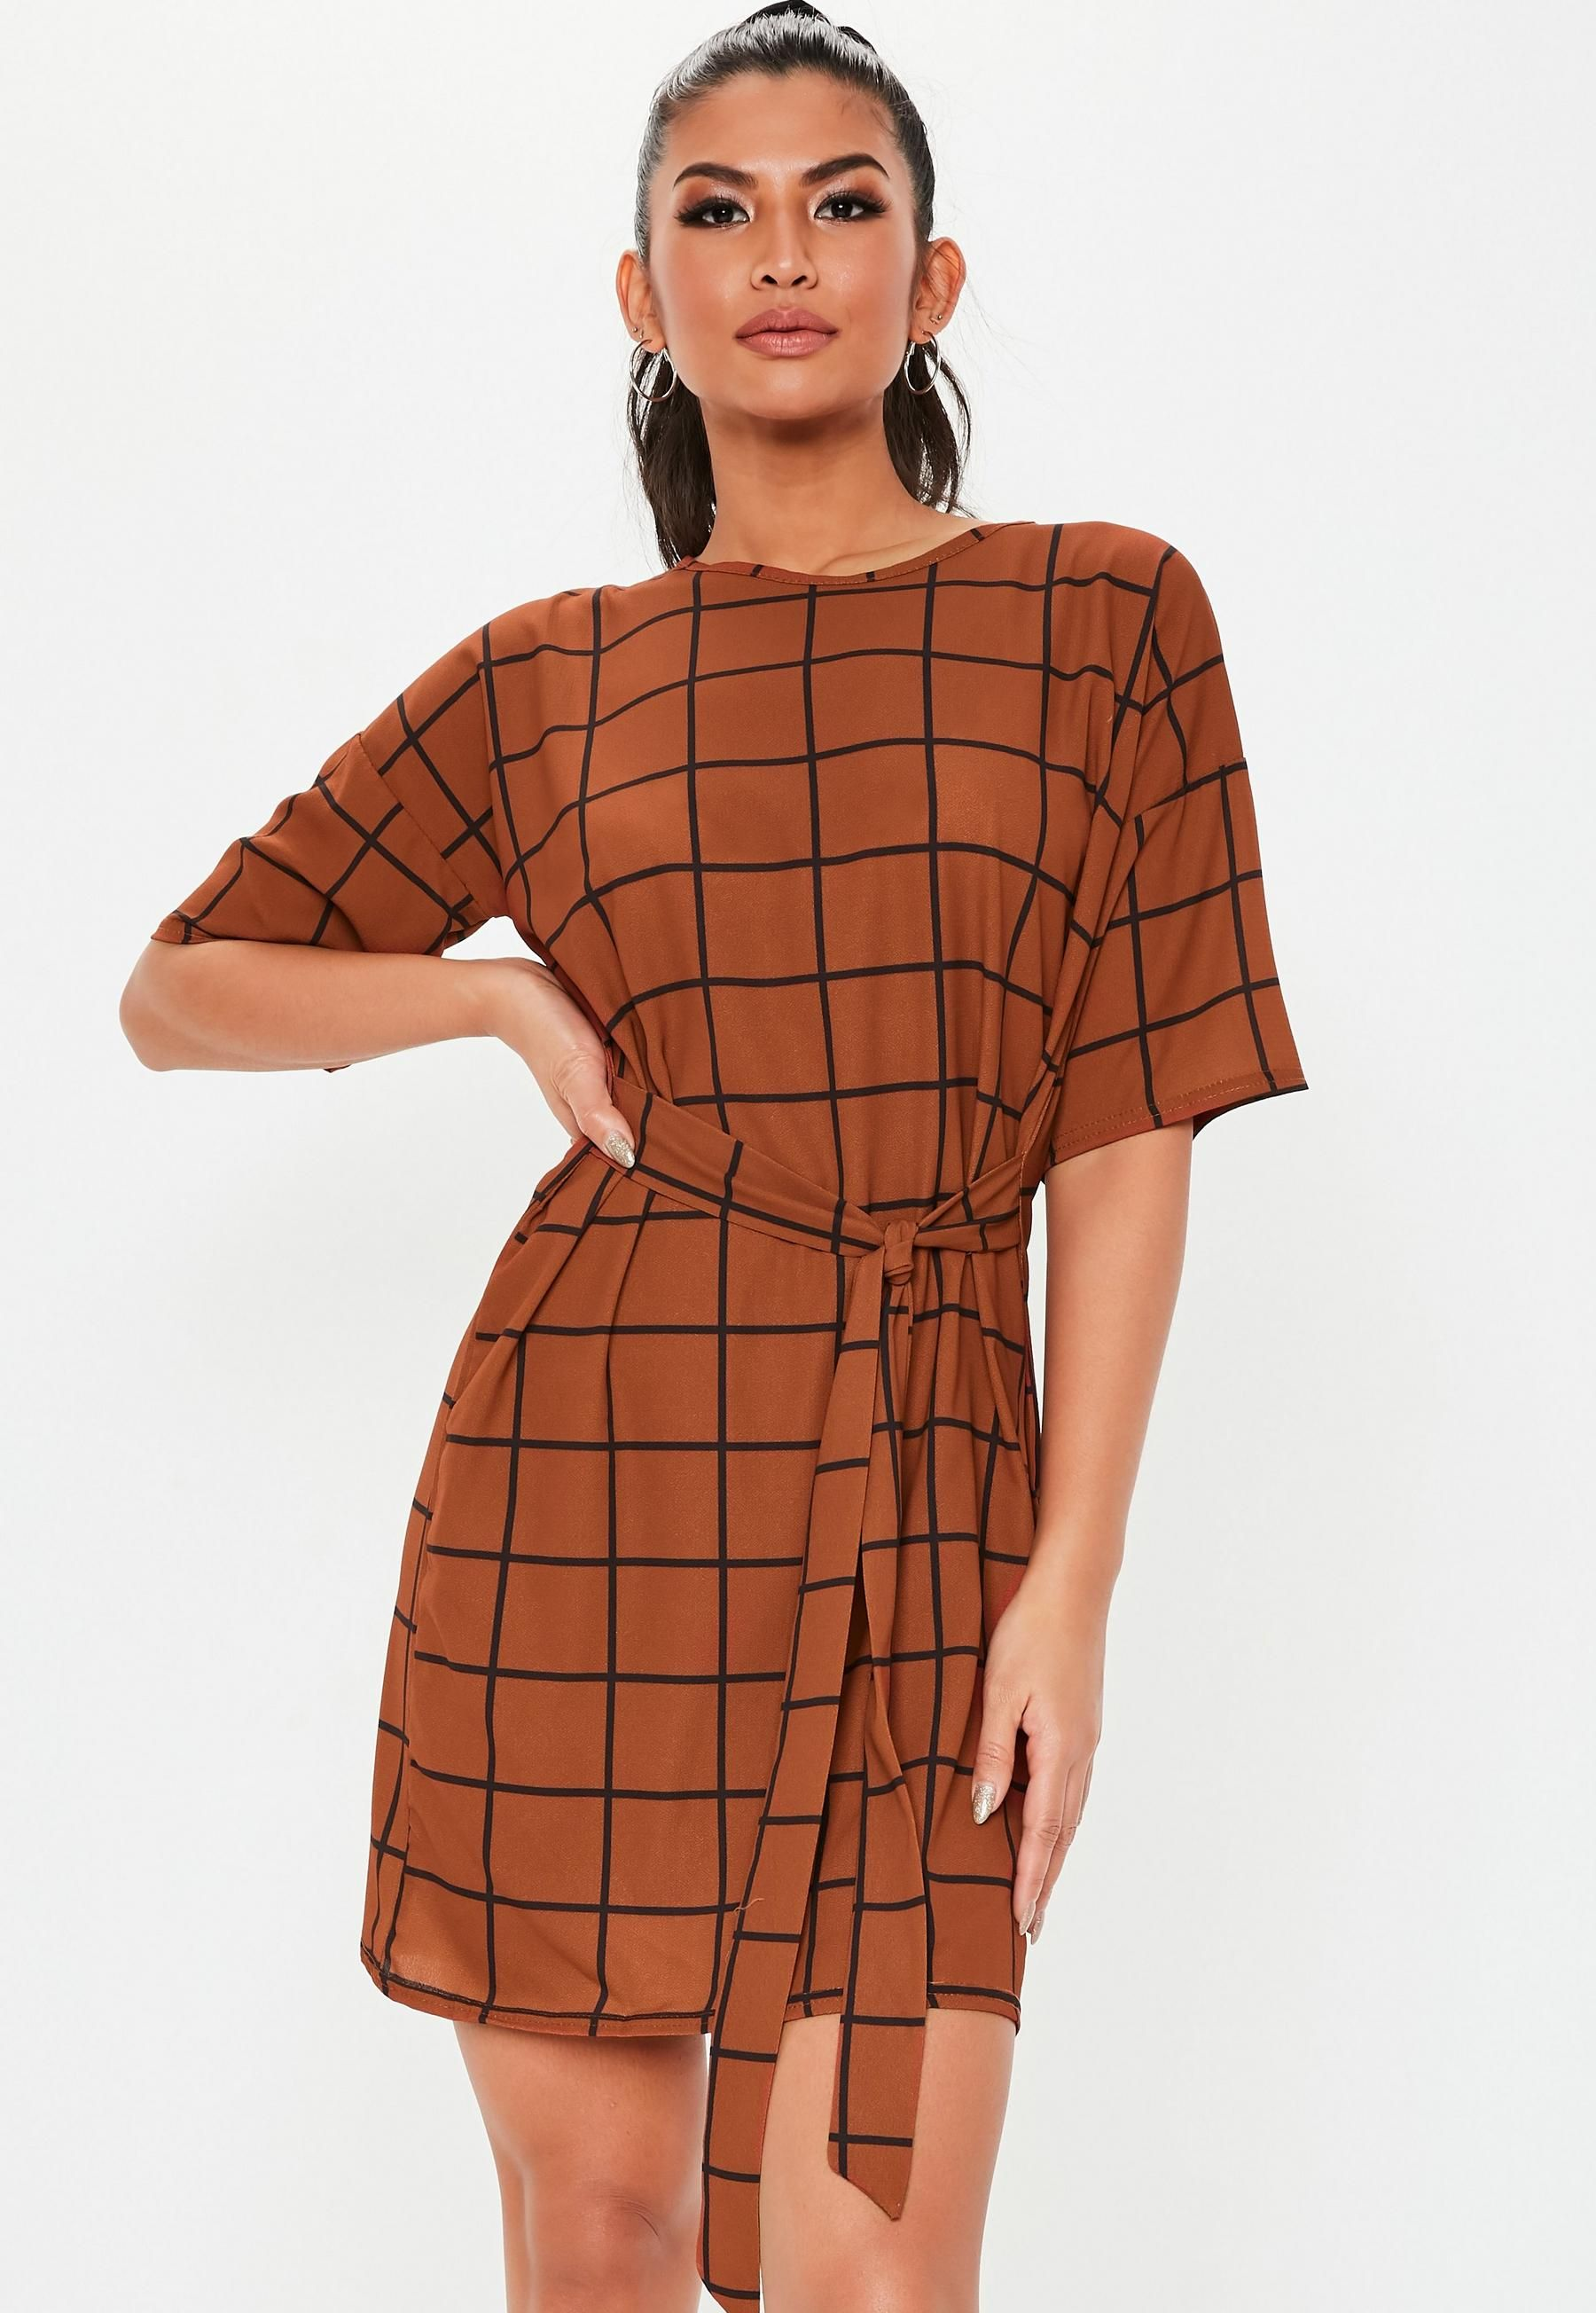 58f22193de Missguided Rust Grid Plaid Tie Waist Shirt Dress in 2019